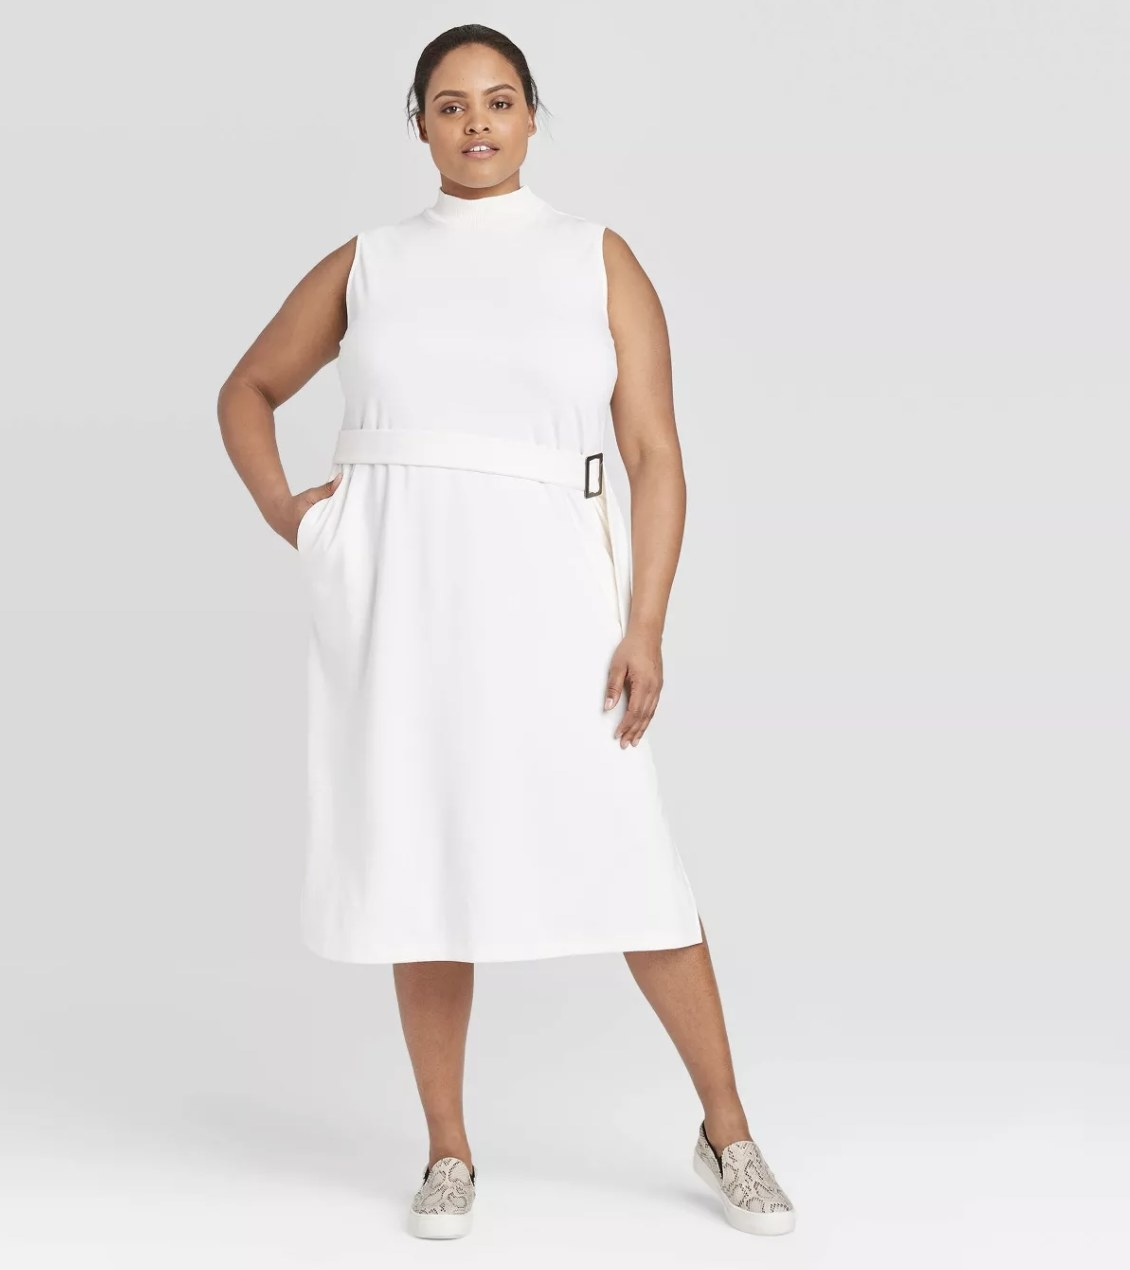 Model wearing the dress in white